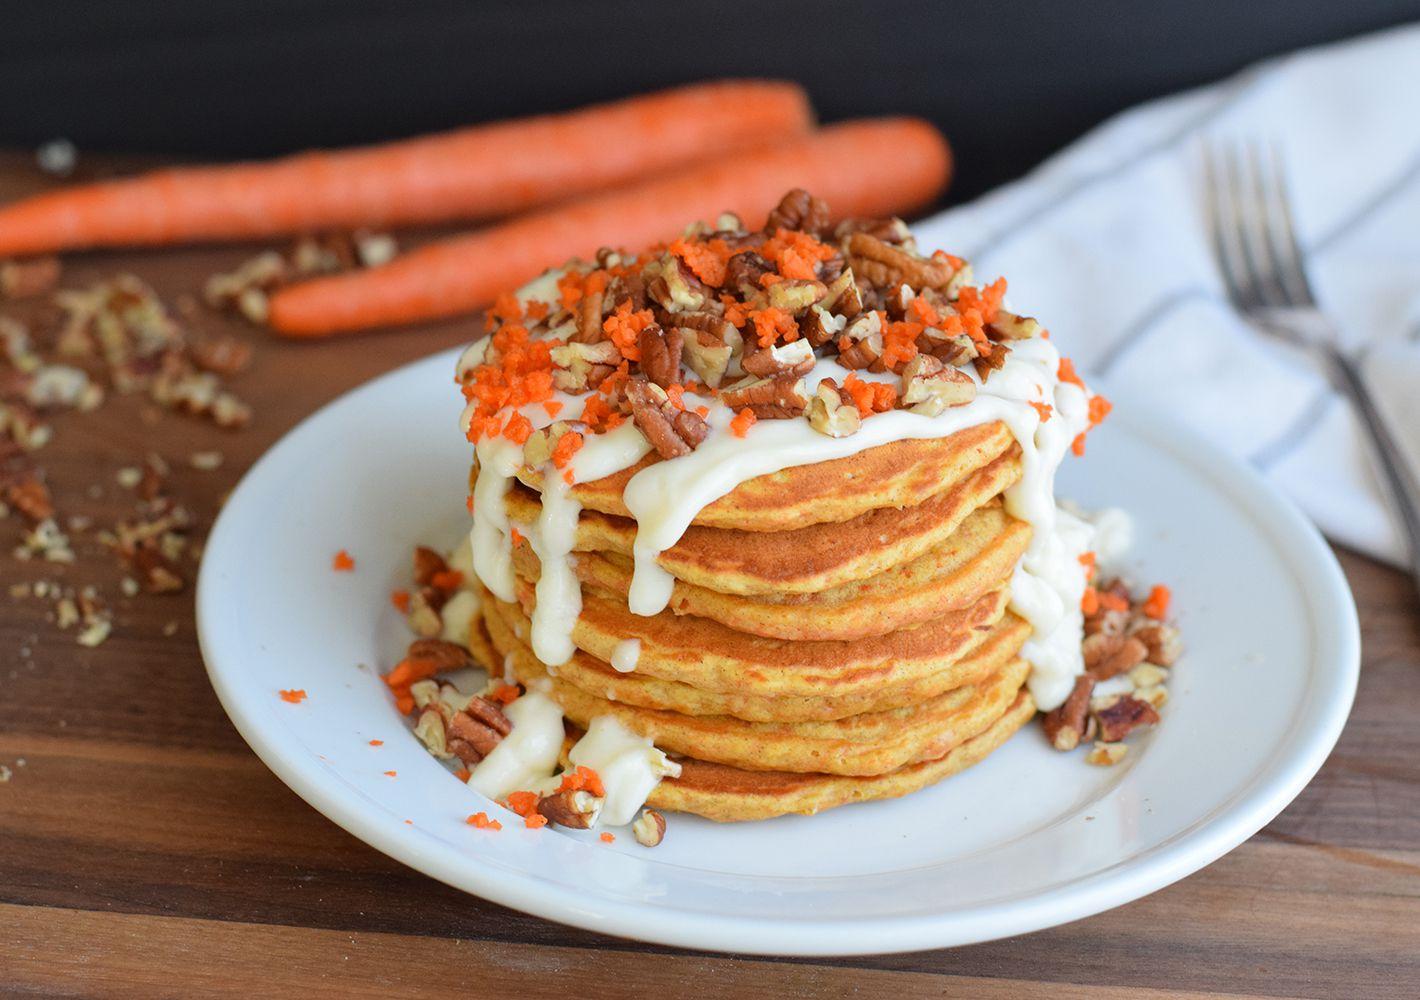 Carrot Cake Pancakes Recipe Cómo hacer mug cake de zanahoria. carrot cake pancakes